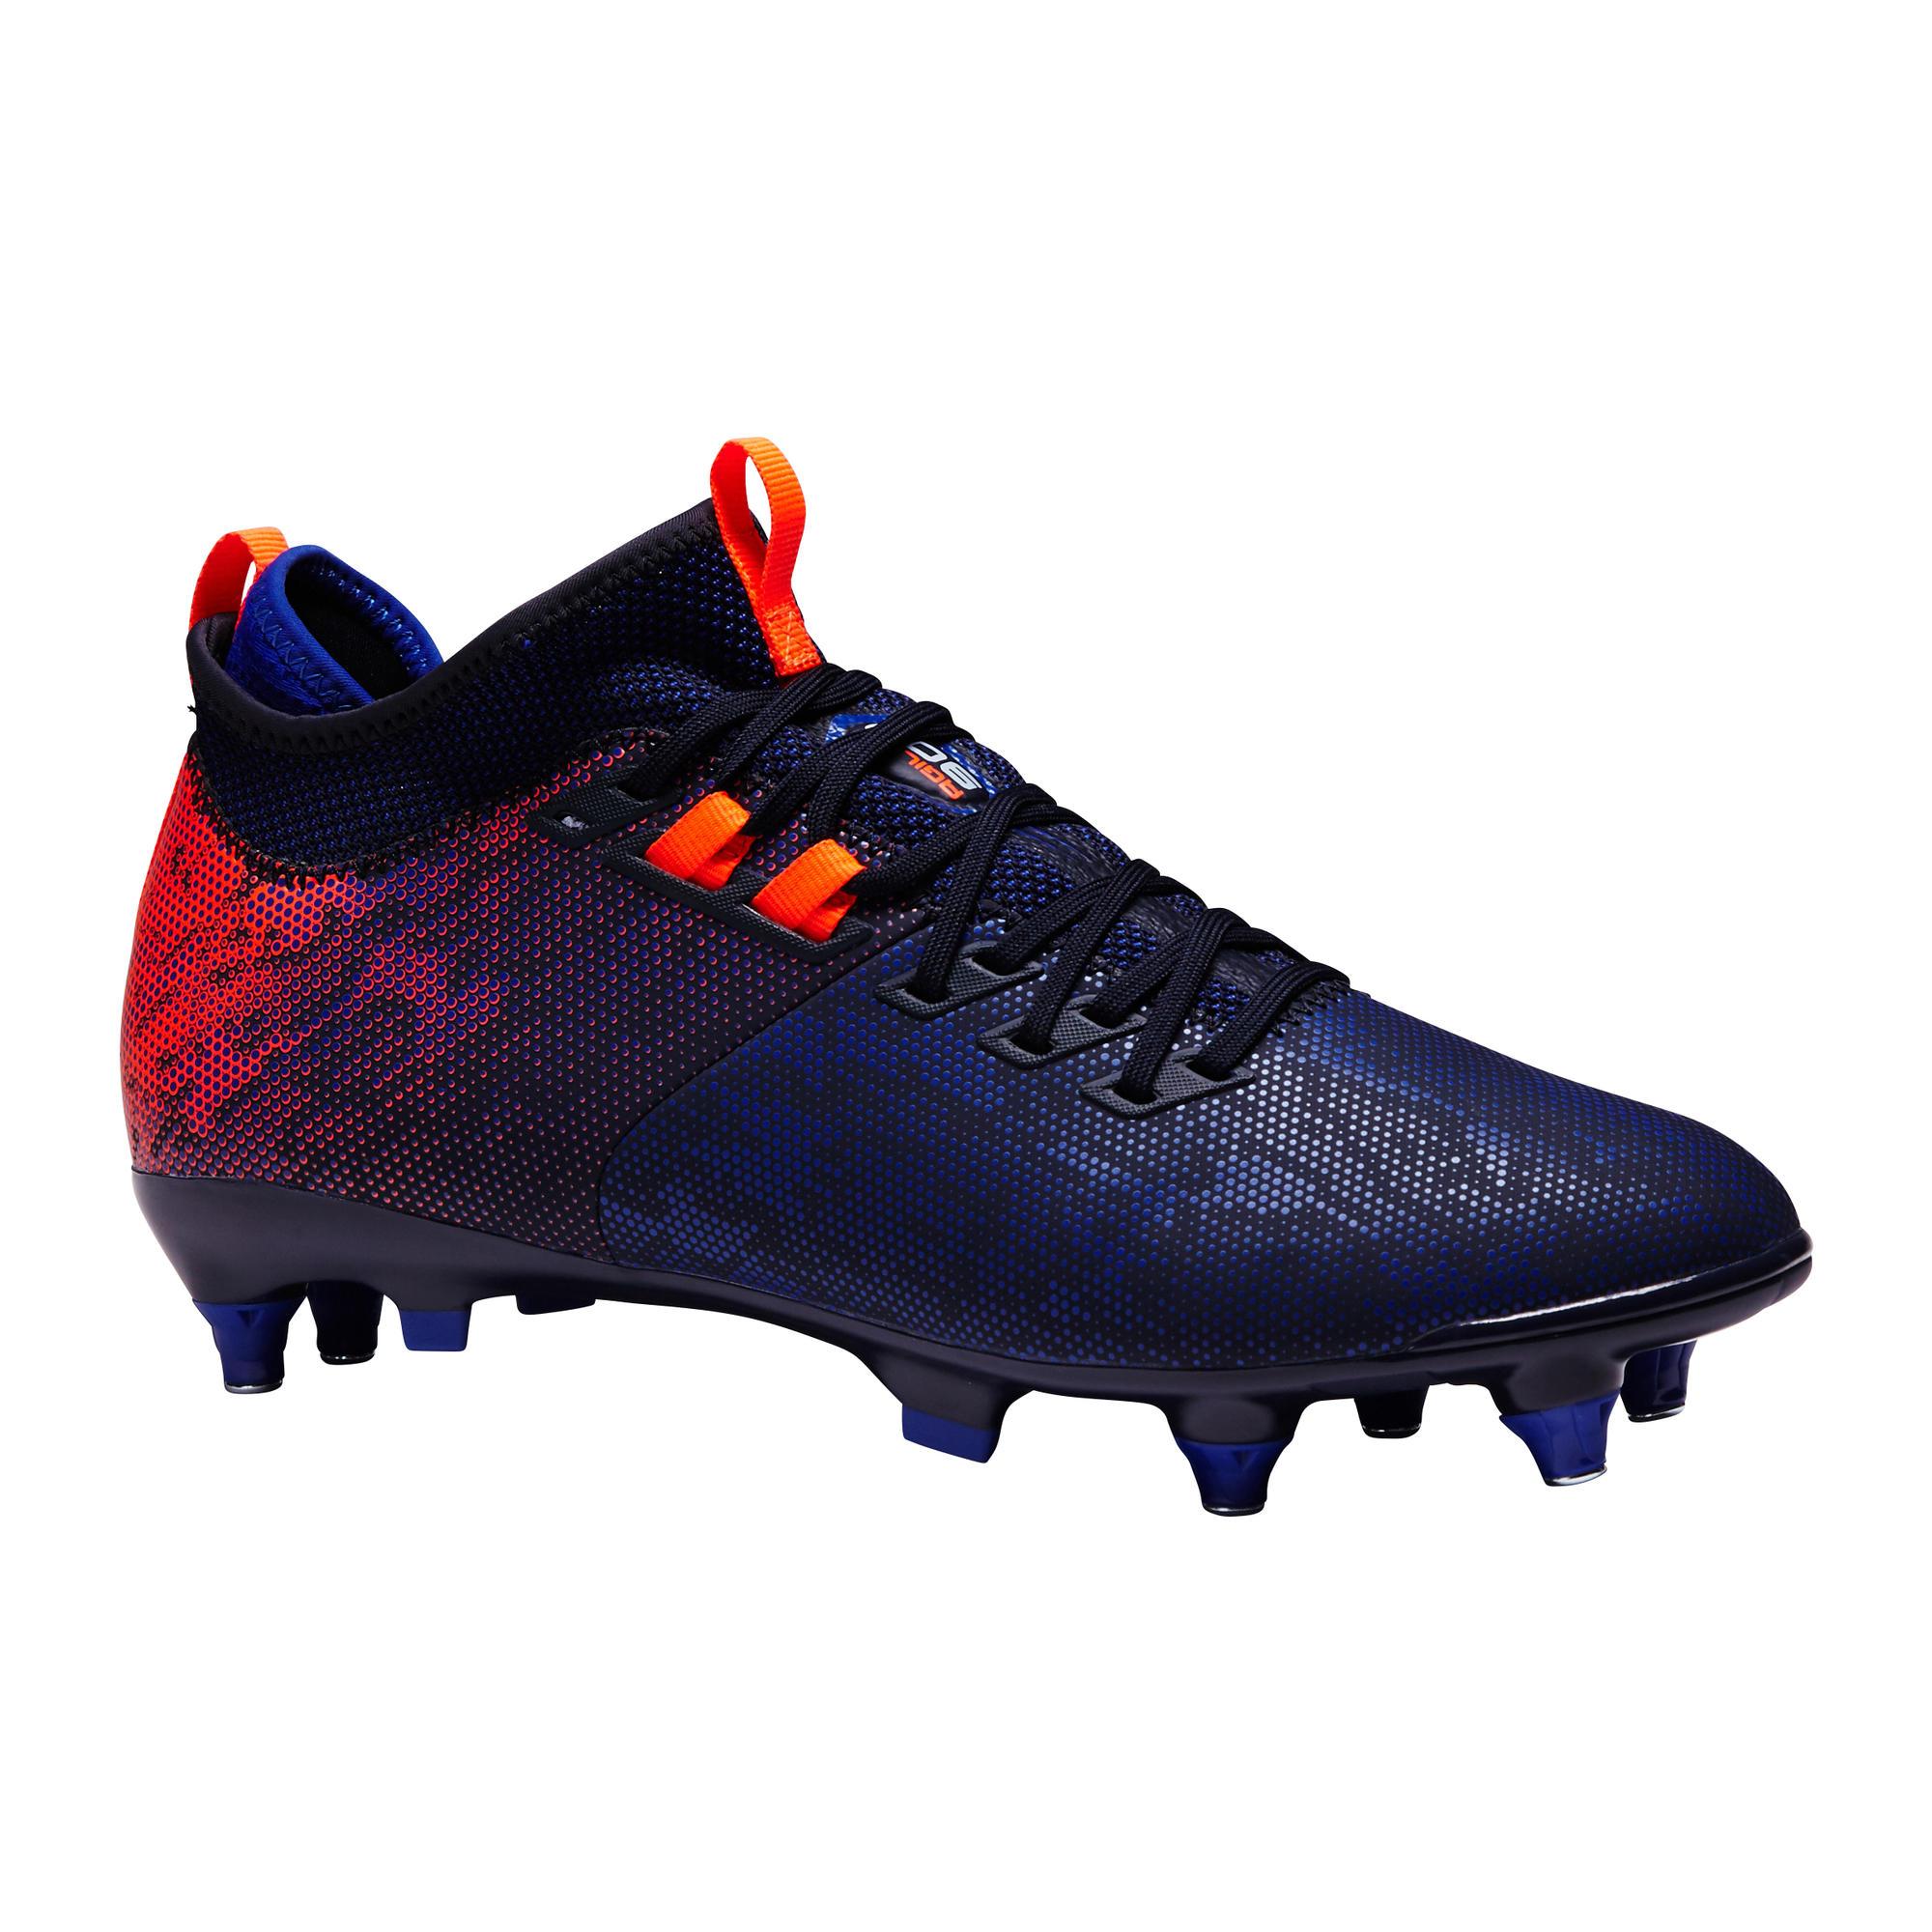 ebb1ca799 Chaussures - Chaussure de football adulte terrain gras Agility 900 MiD SG  bleue & orange